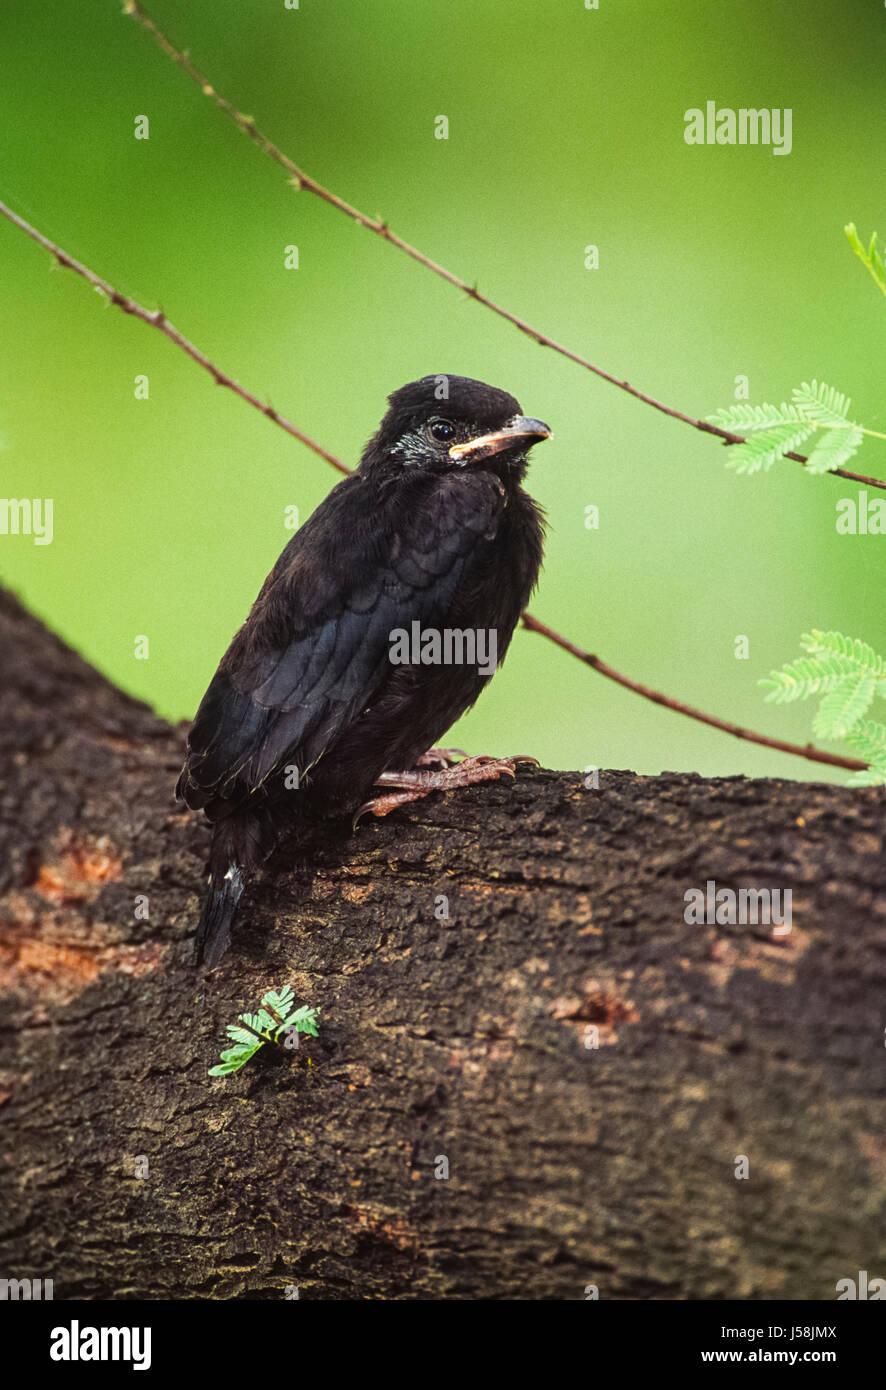 Black Drongo fledgling, Dicrurus macrocercus,perched on branch, Keoladeo Ghana National Park, Bharatpur, Rajasthan, - Stock Image